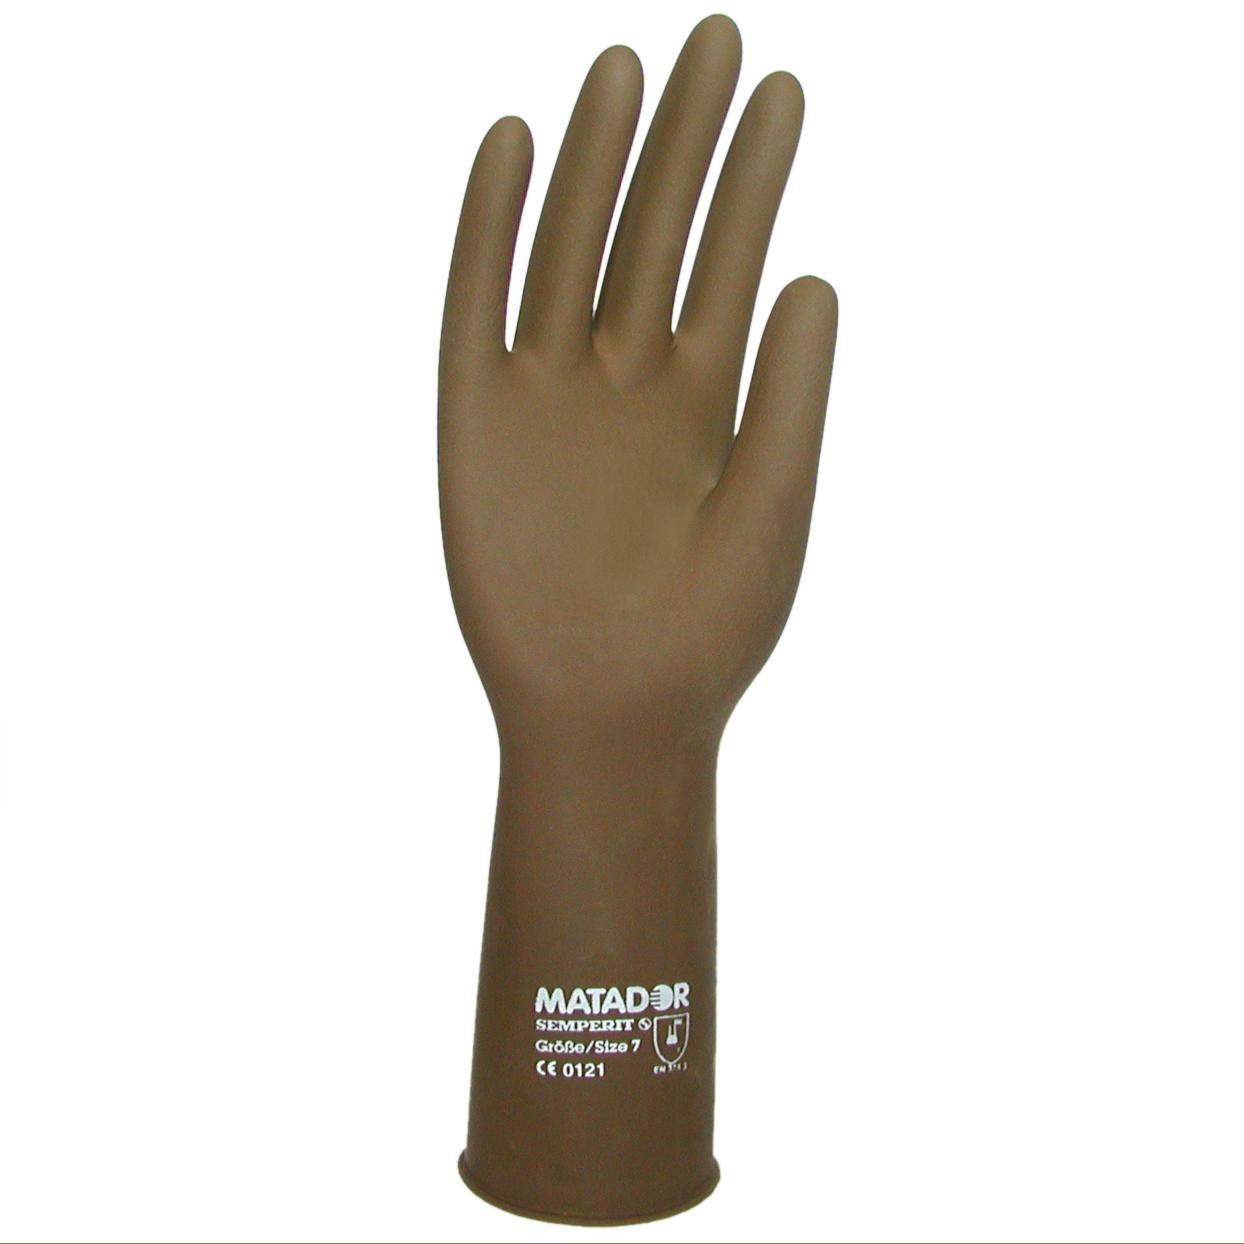 Matador Latex glove - latexové ochranné rukavice, 1 pár